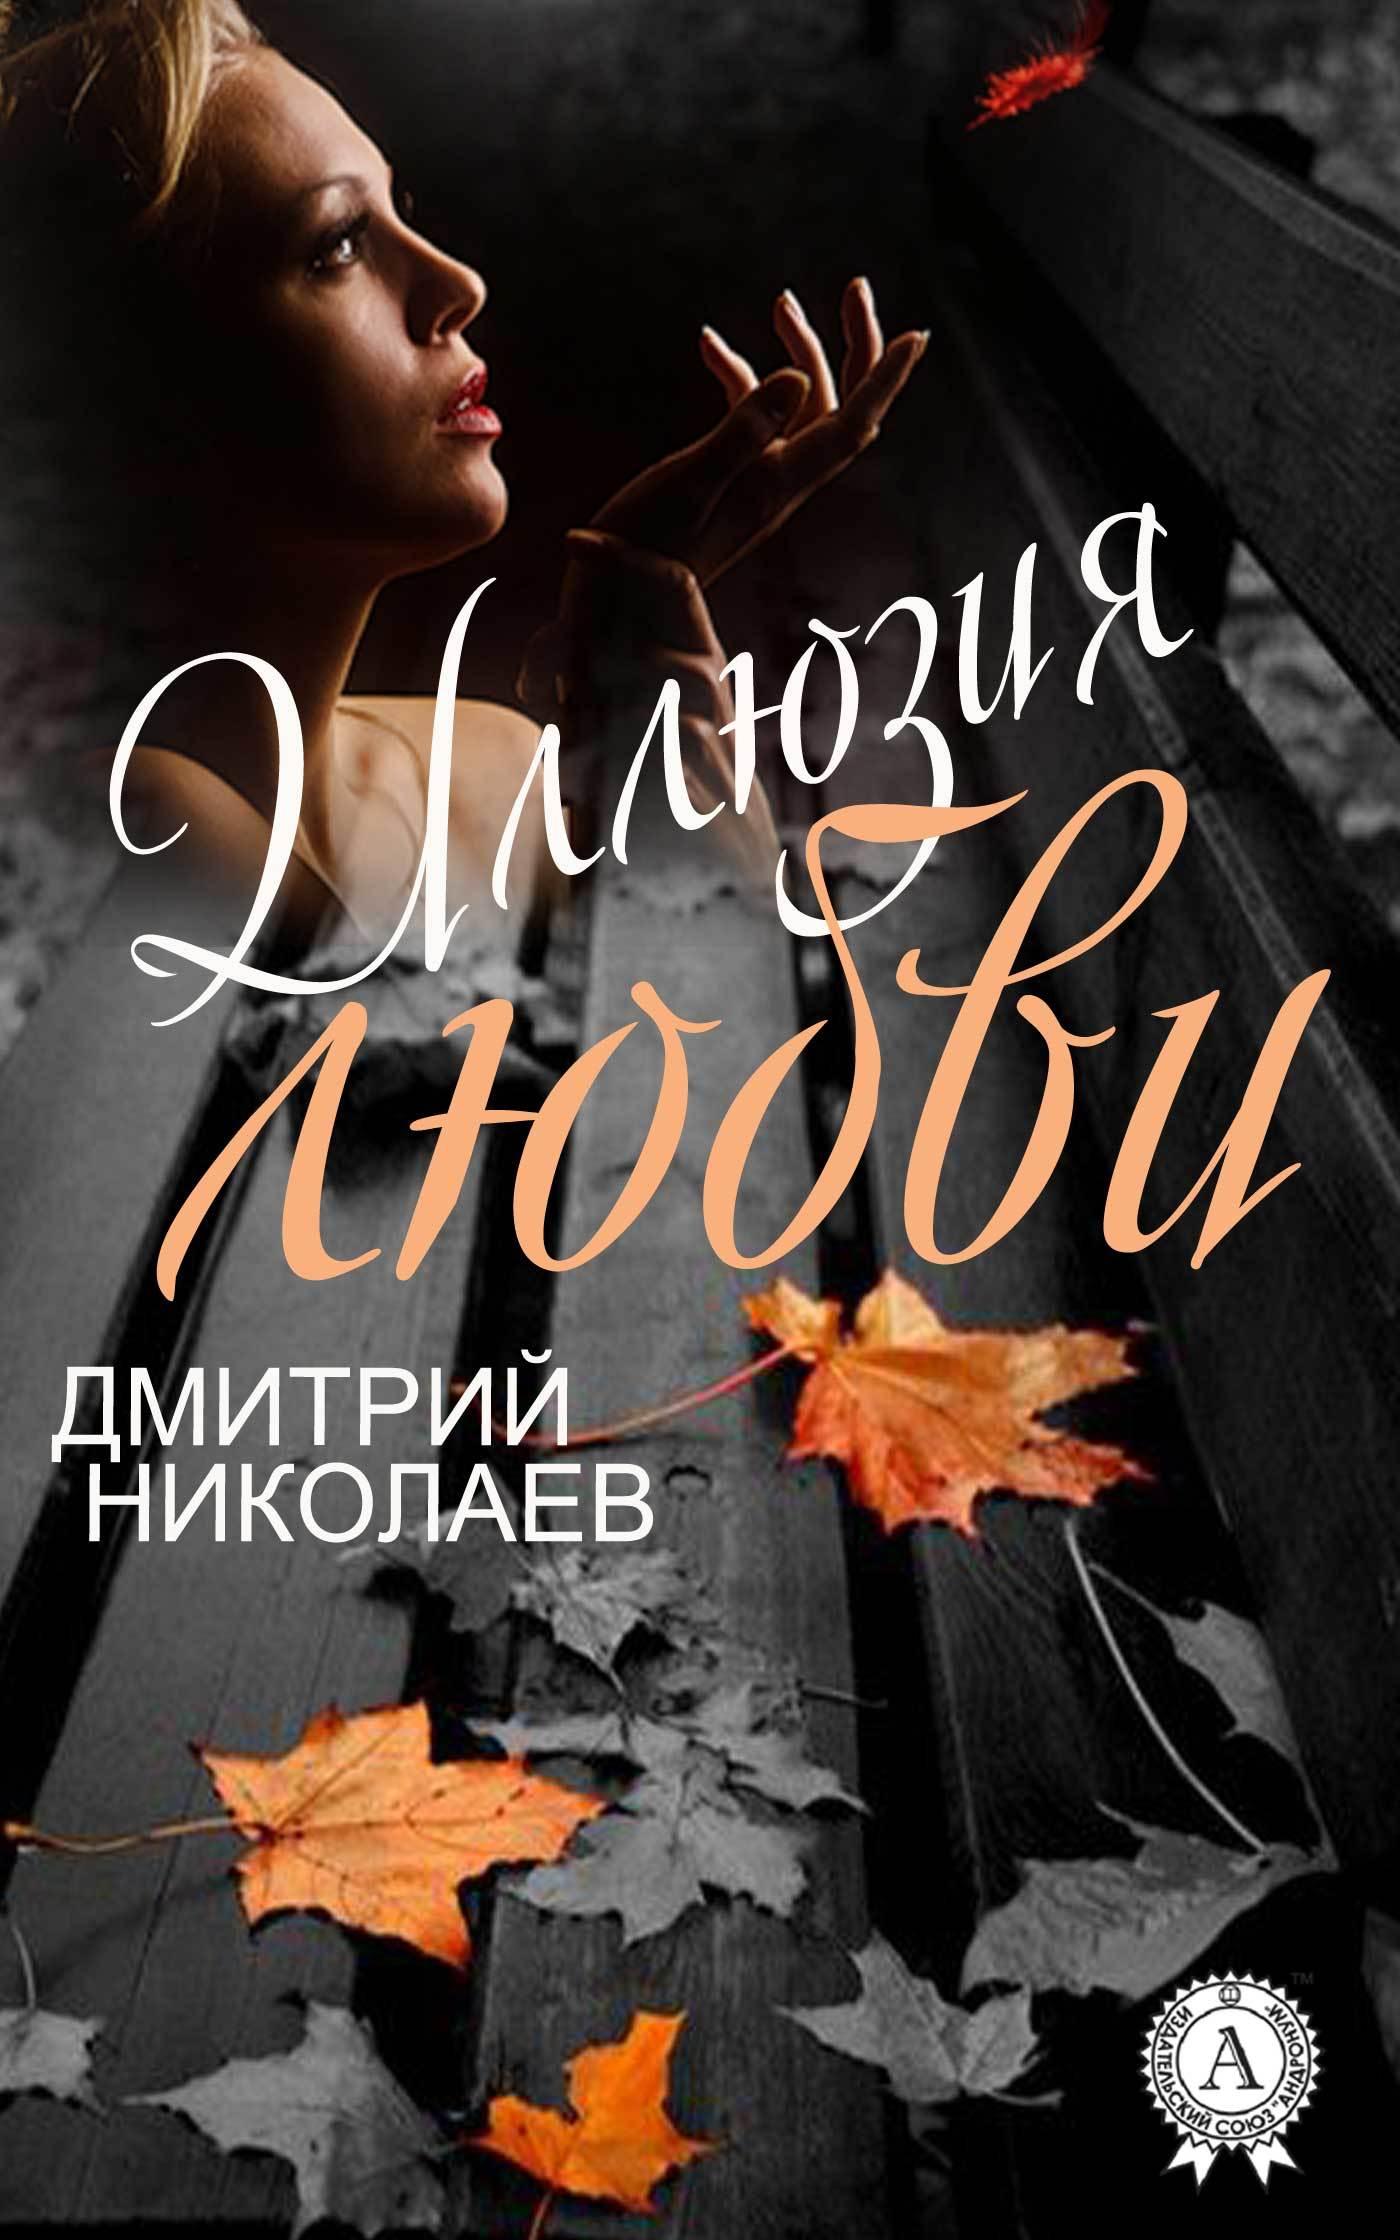 Дмитрий Николаев - Иллюзия любви